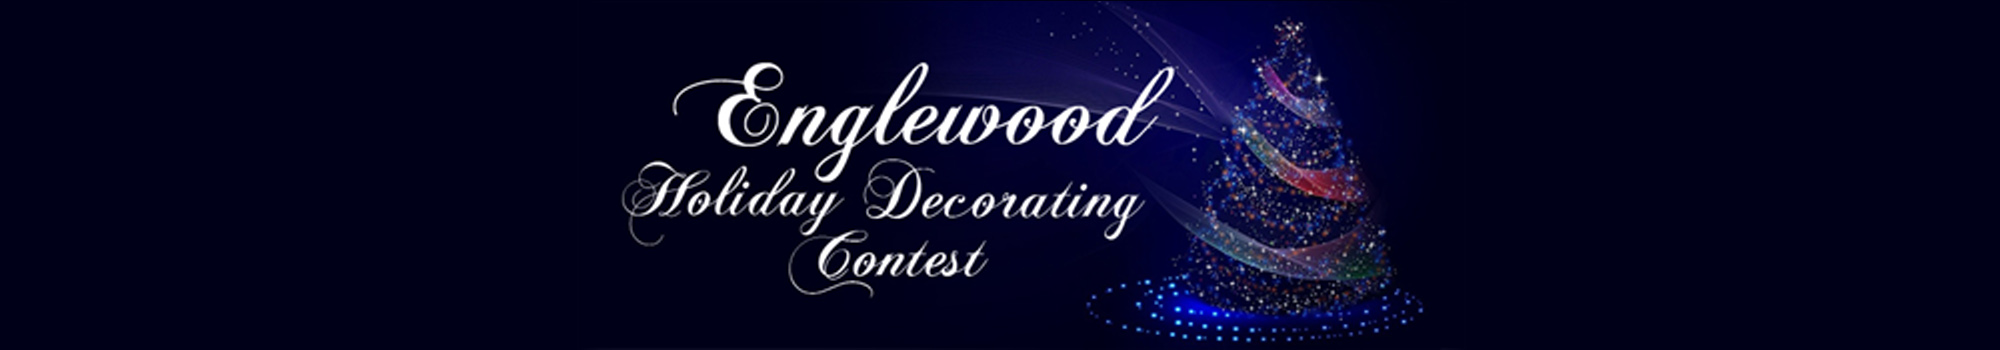 Englewood Holiday Decorating Contest